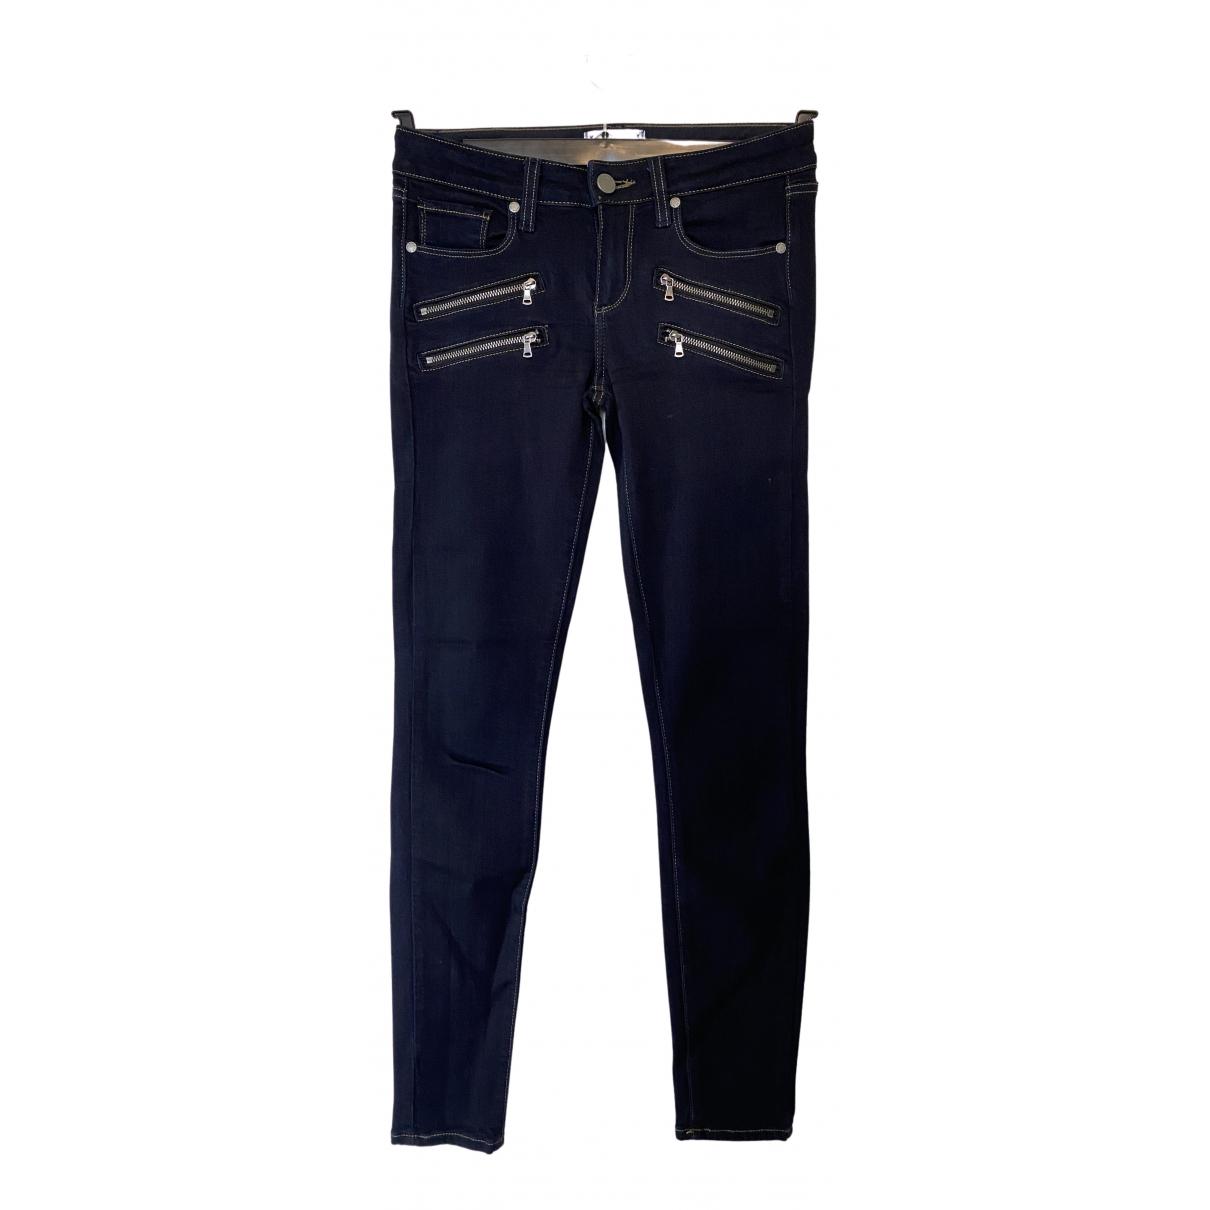 Paige Jeans N Blue Denim - Jeans Trousers for Women 10 UK